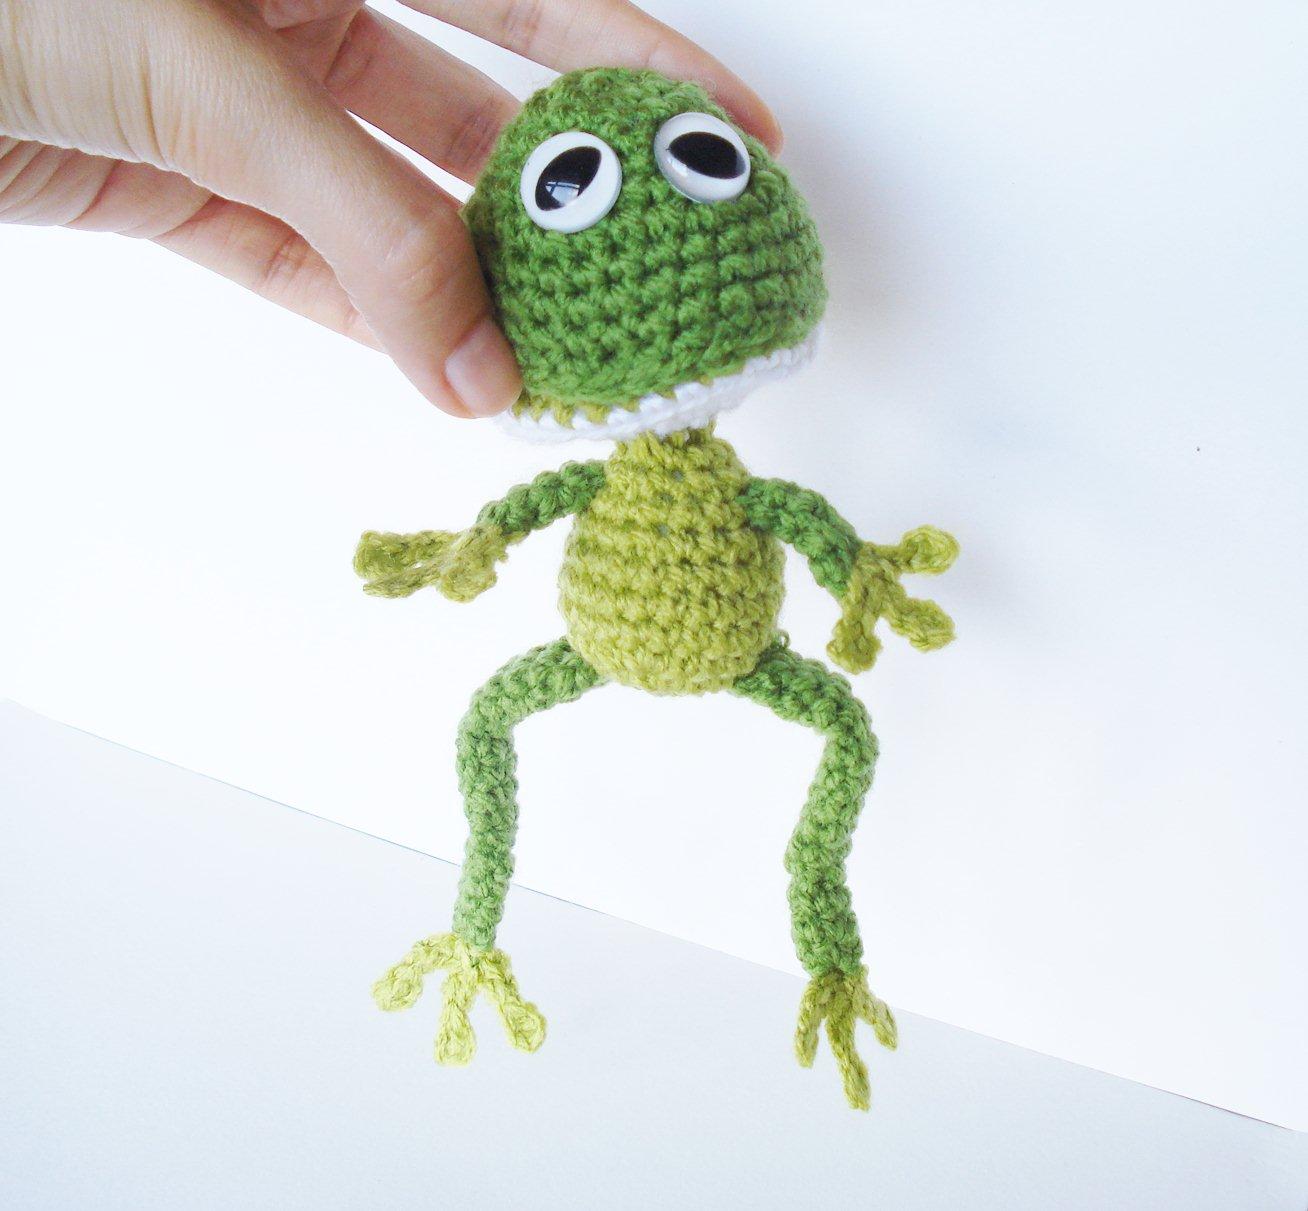 Amigurumi Frog Free Pattern : AllSoCute Amigurumis: Amigurumi Frog Pattern, Crochet Frog ...